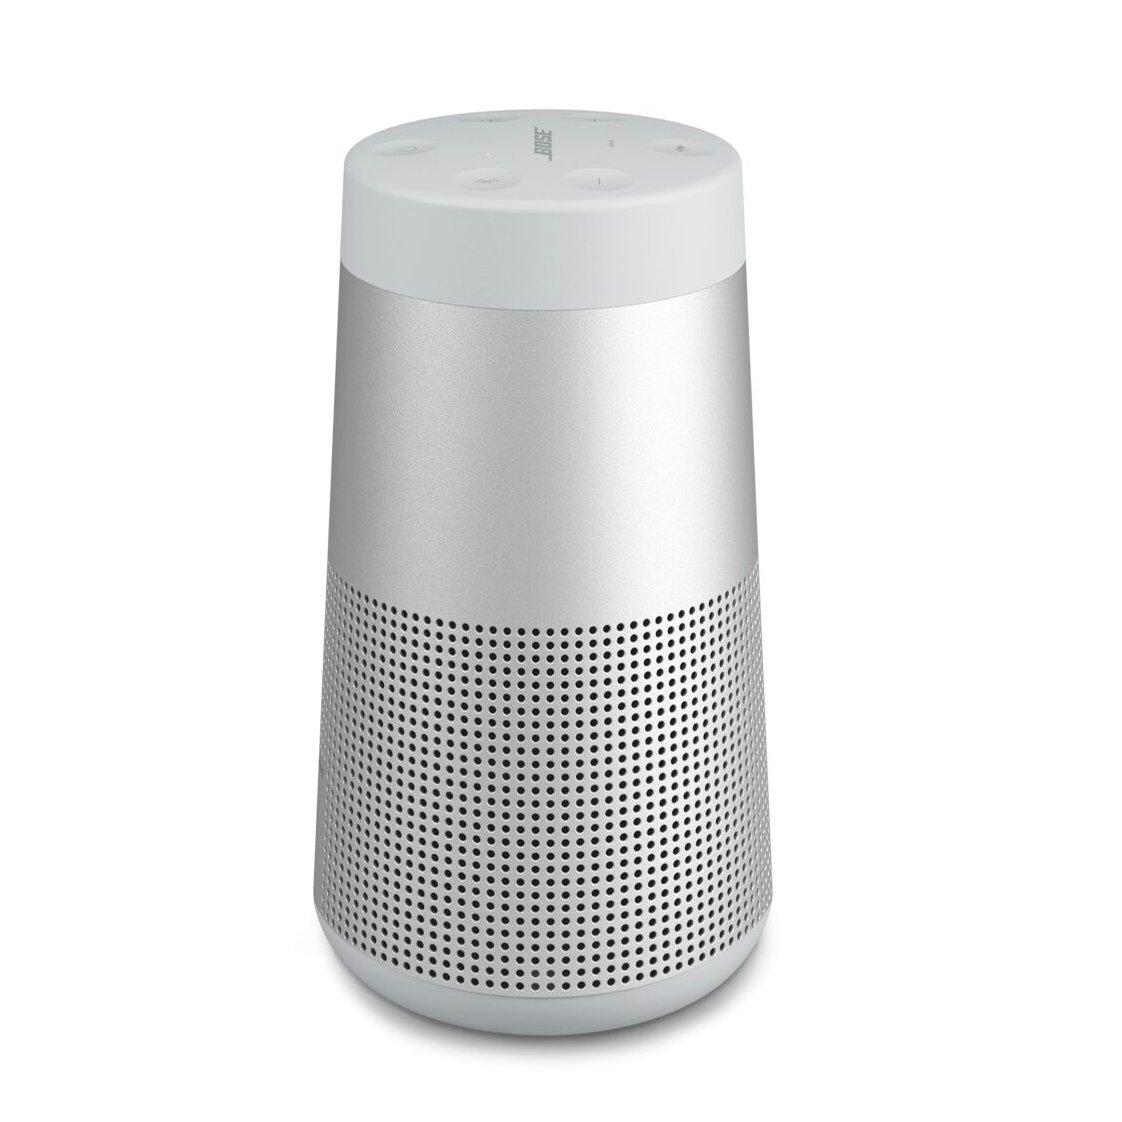 Bose Soundlink Revolve II Wireless Bluetooth Speaker - Grey